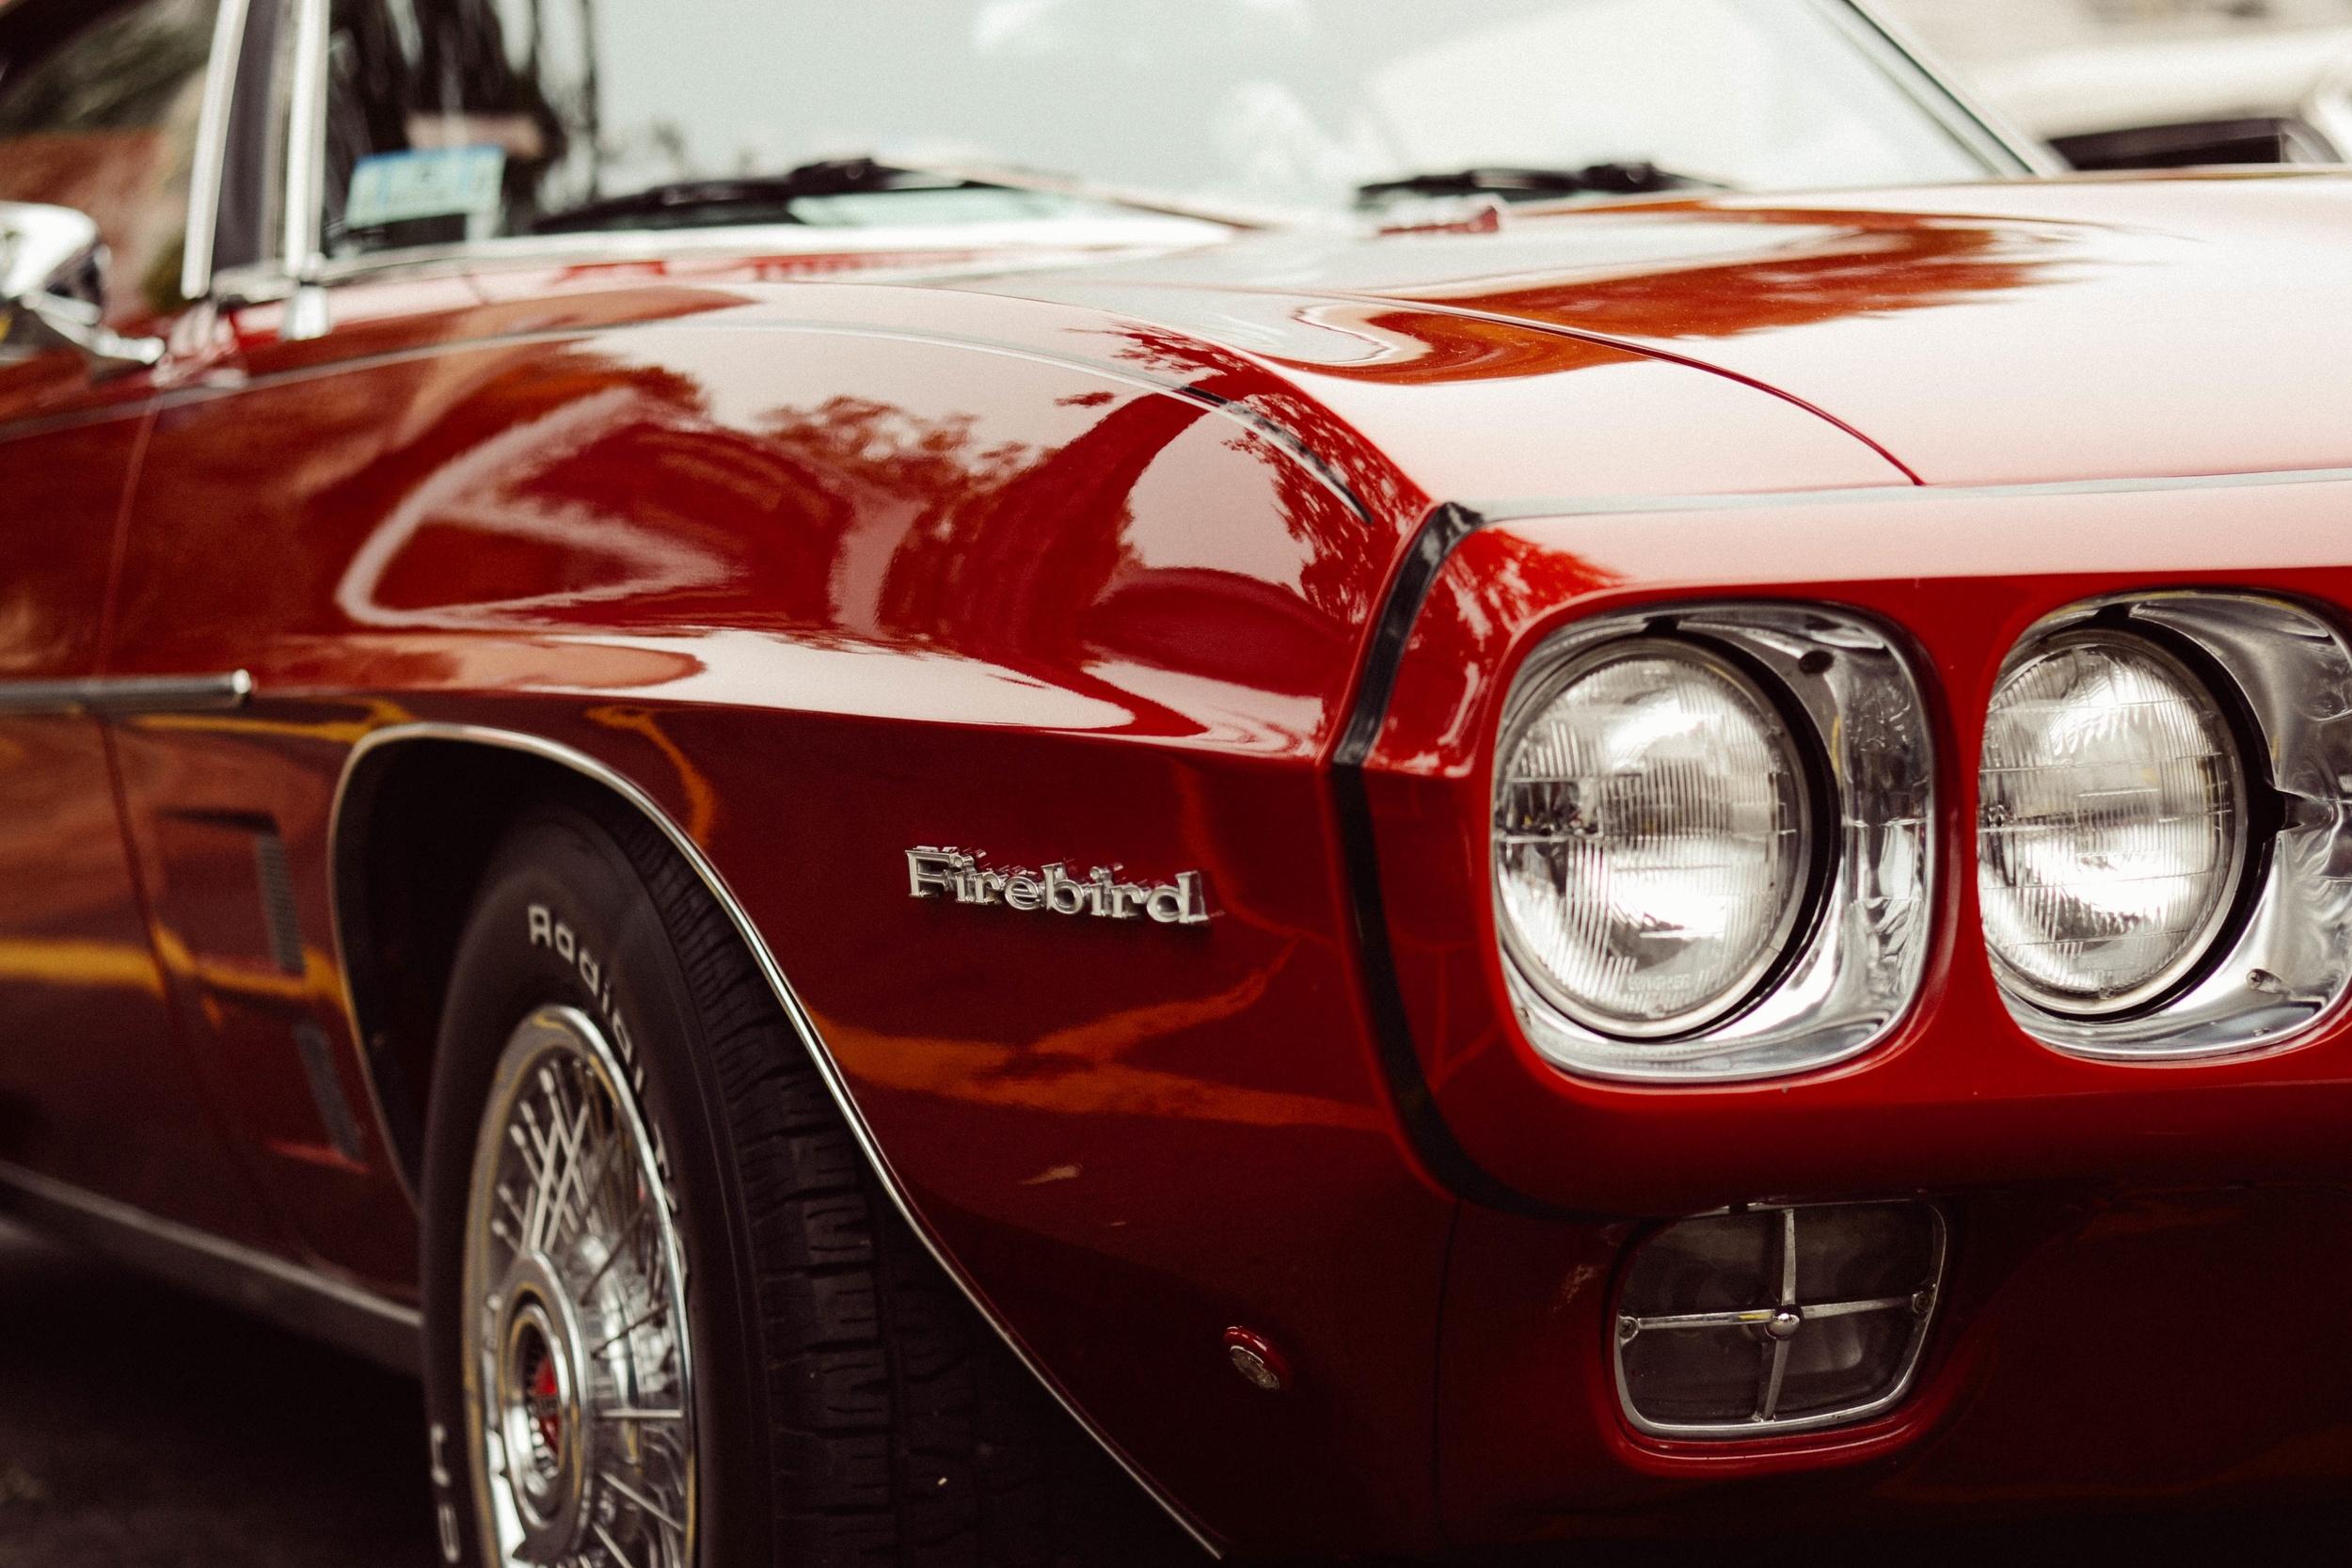 Car red 02.jpeg